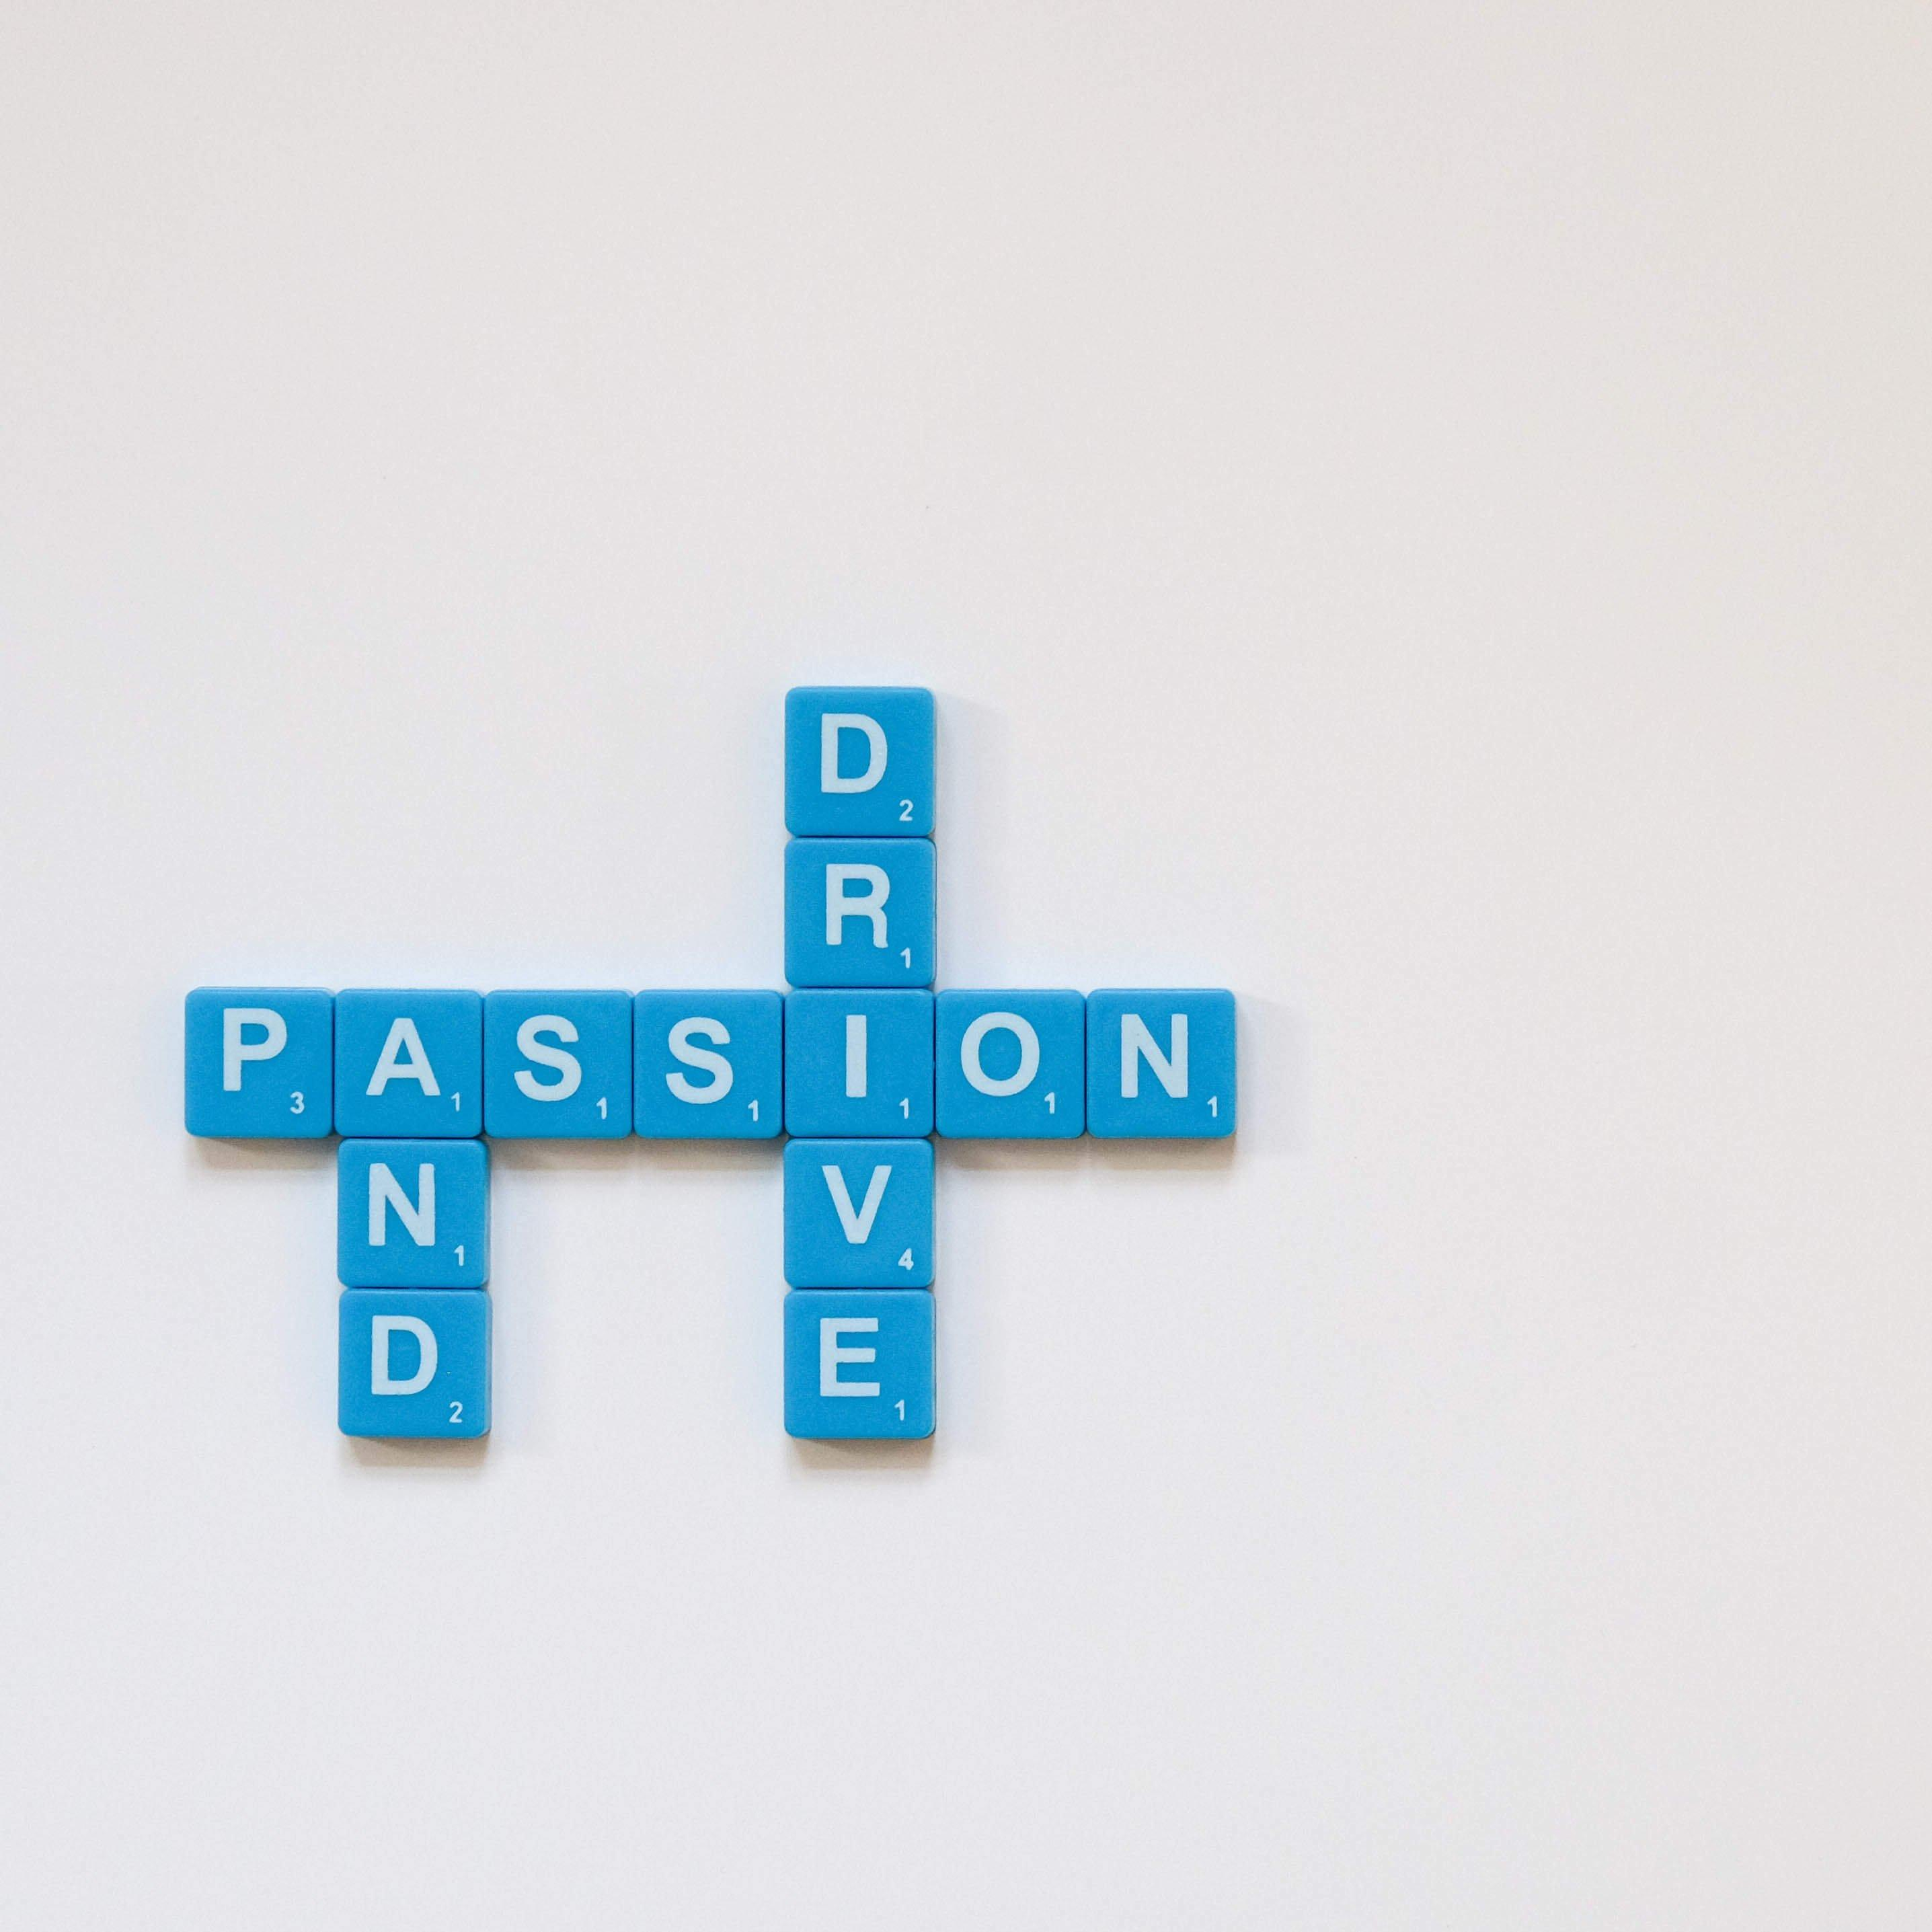 Online Marketing Jobs onehundred.digital